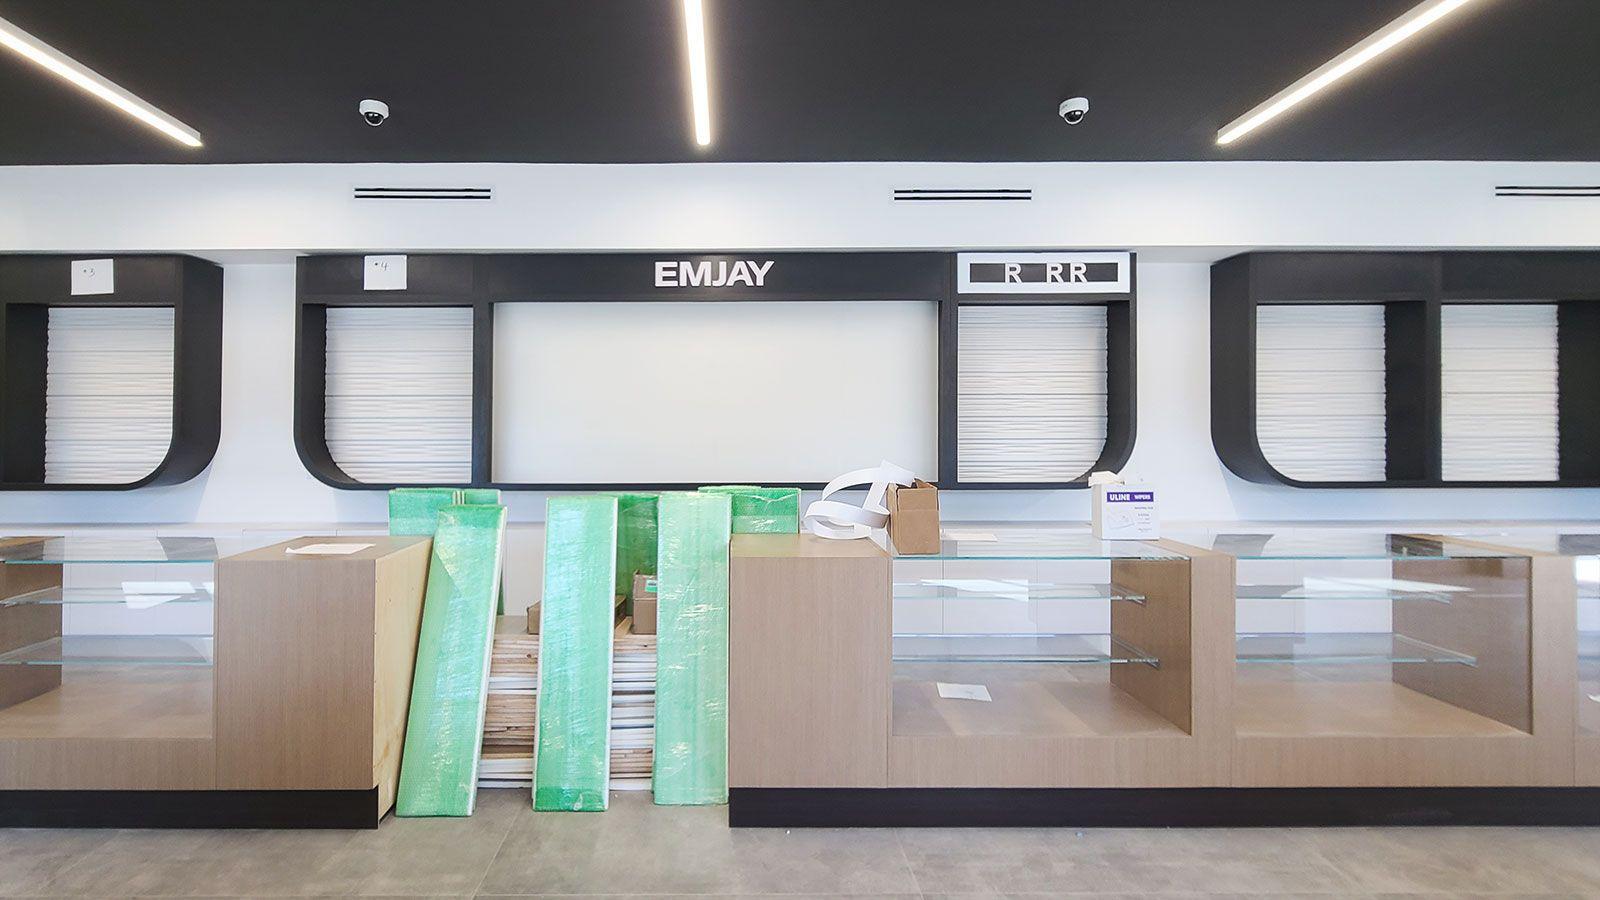 Emjay custom PVC 3D letters